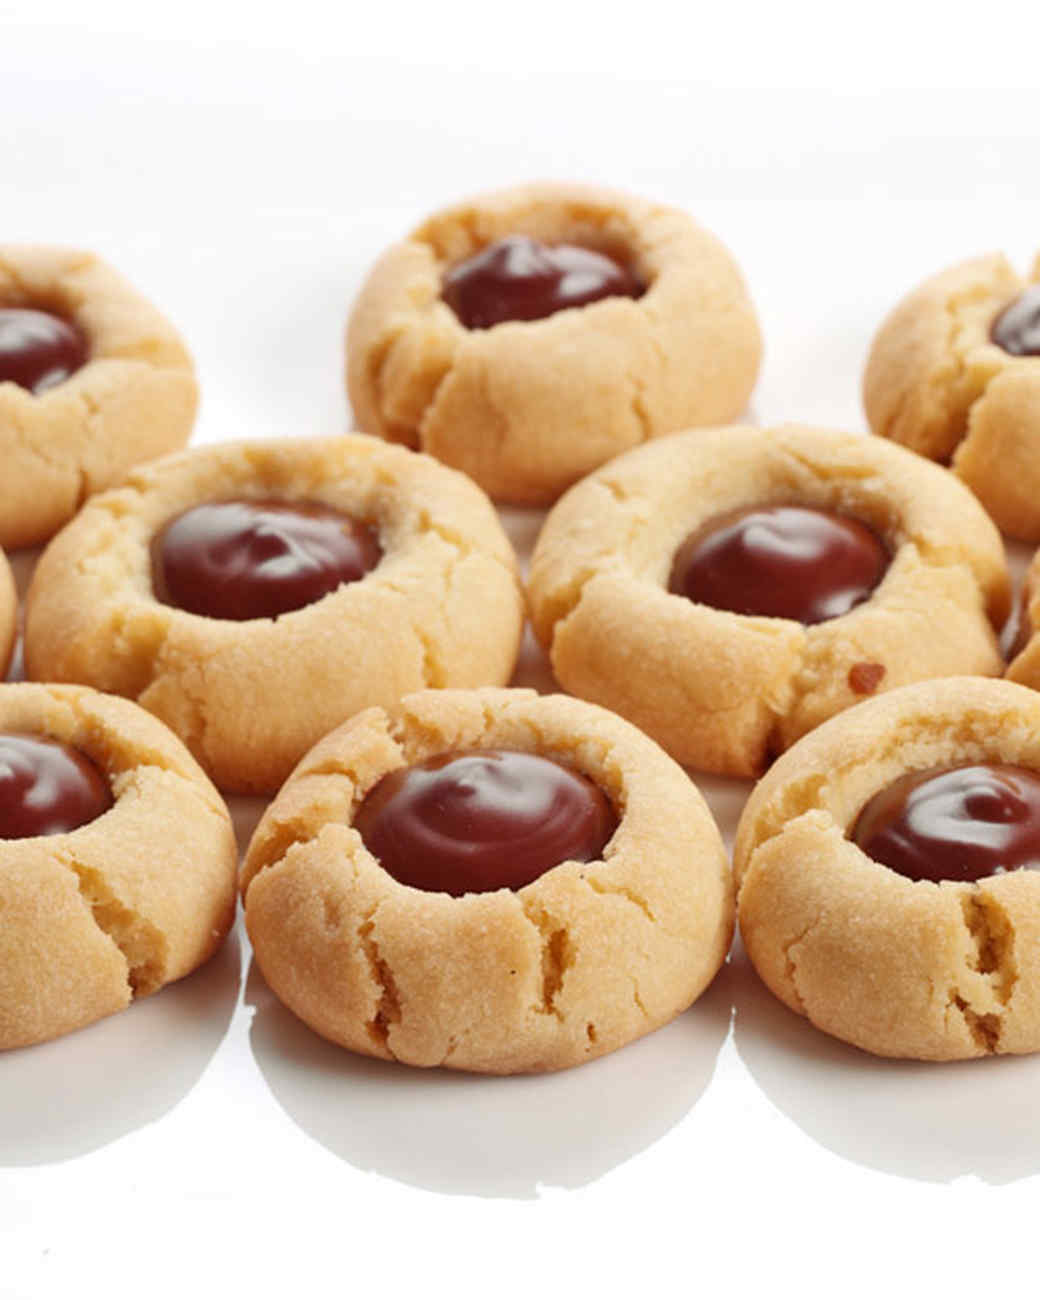 Fingerprint cookie recipes